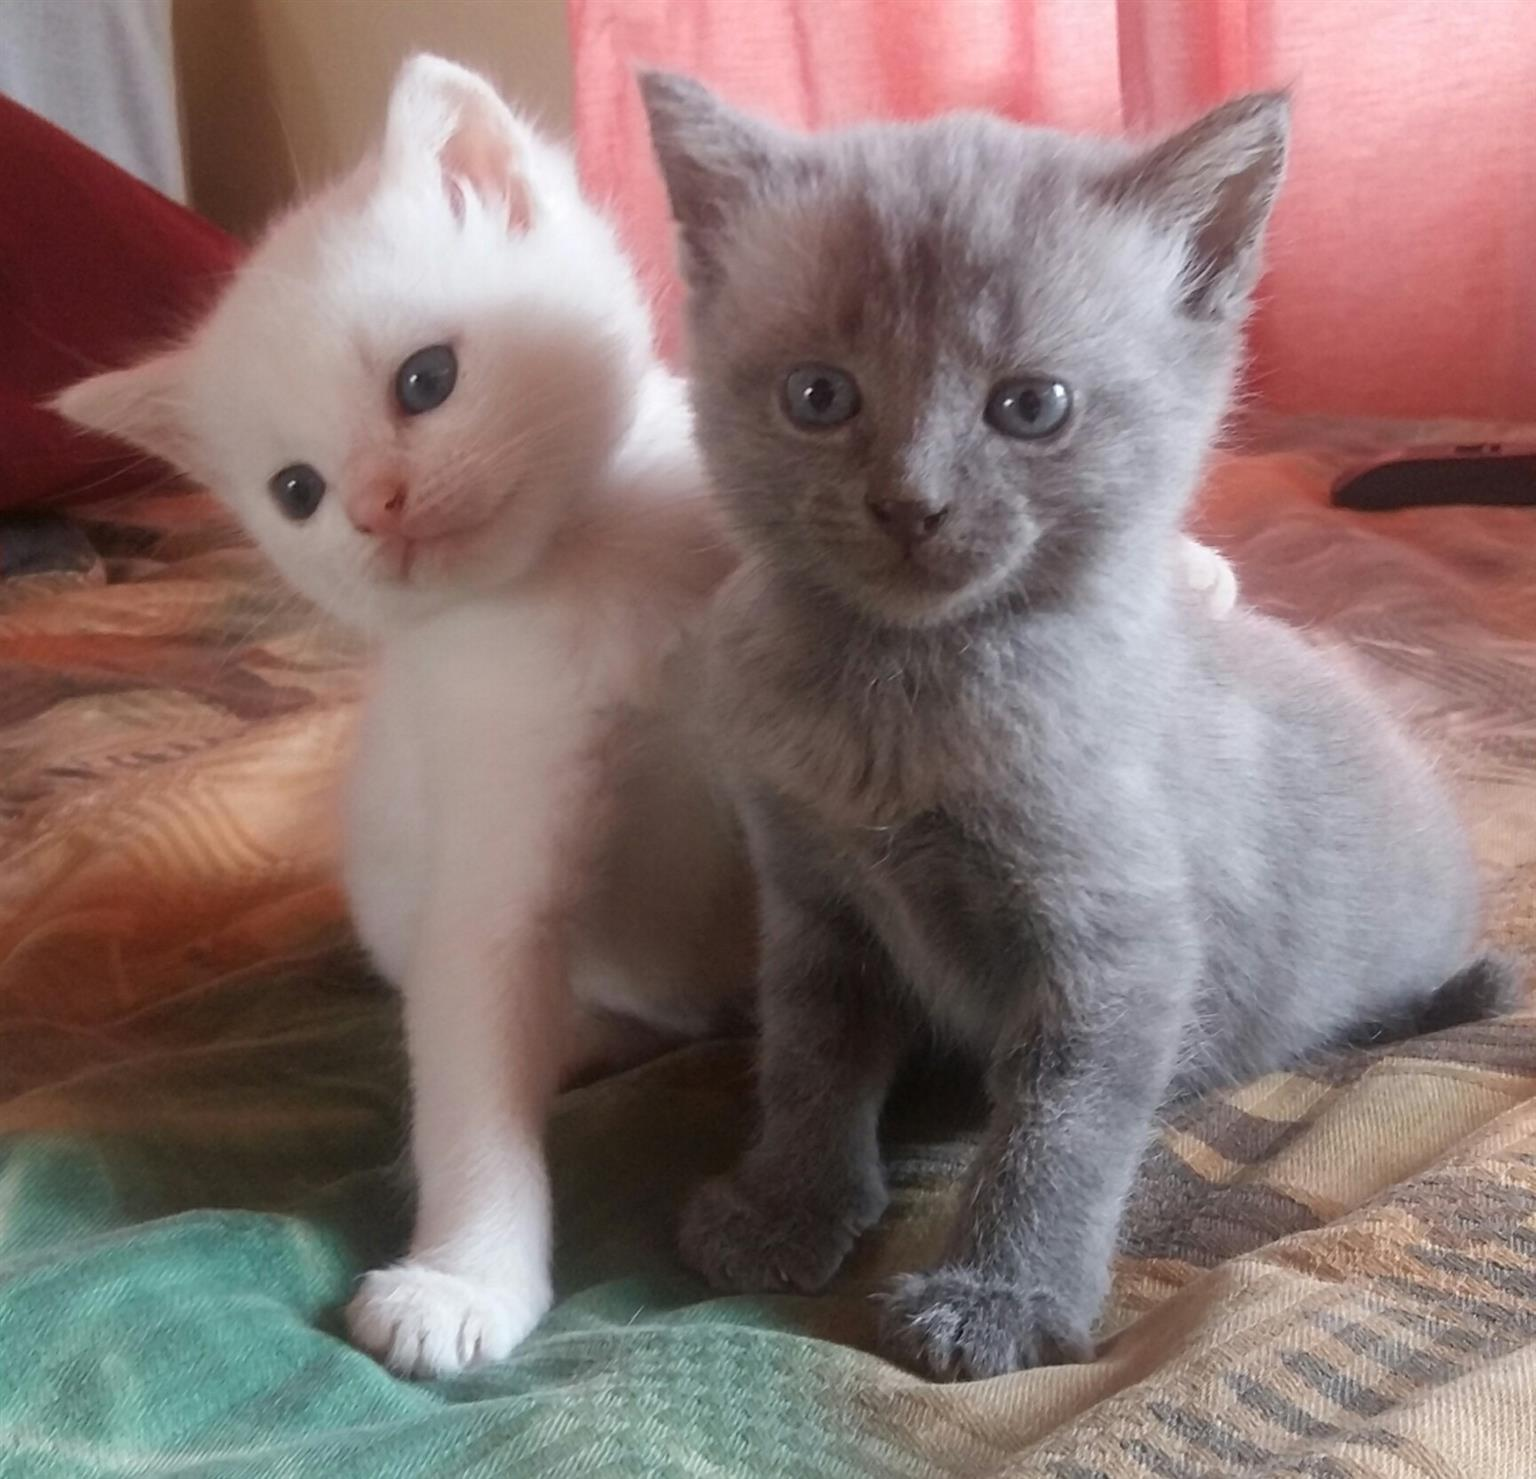 2x Beautiful kittens White-Siamese and Grey